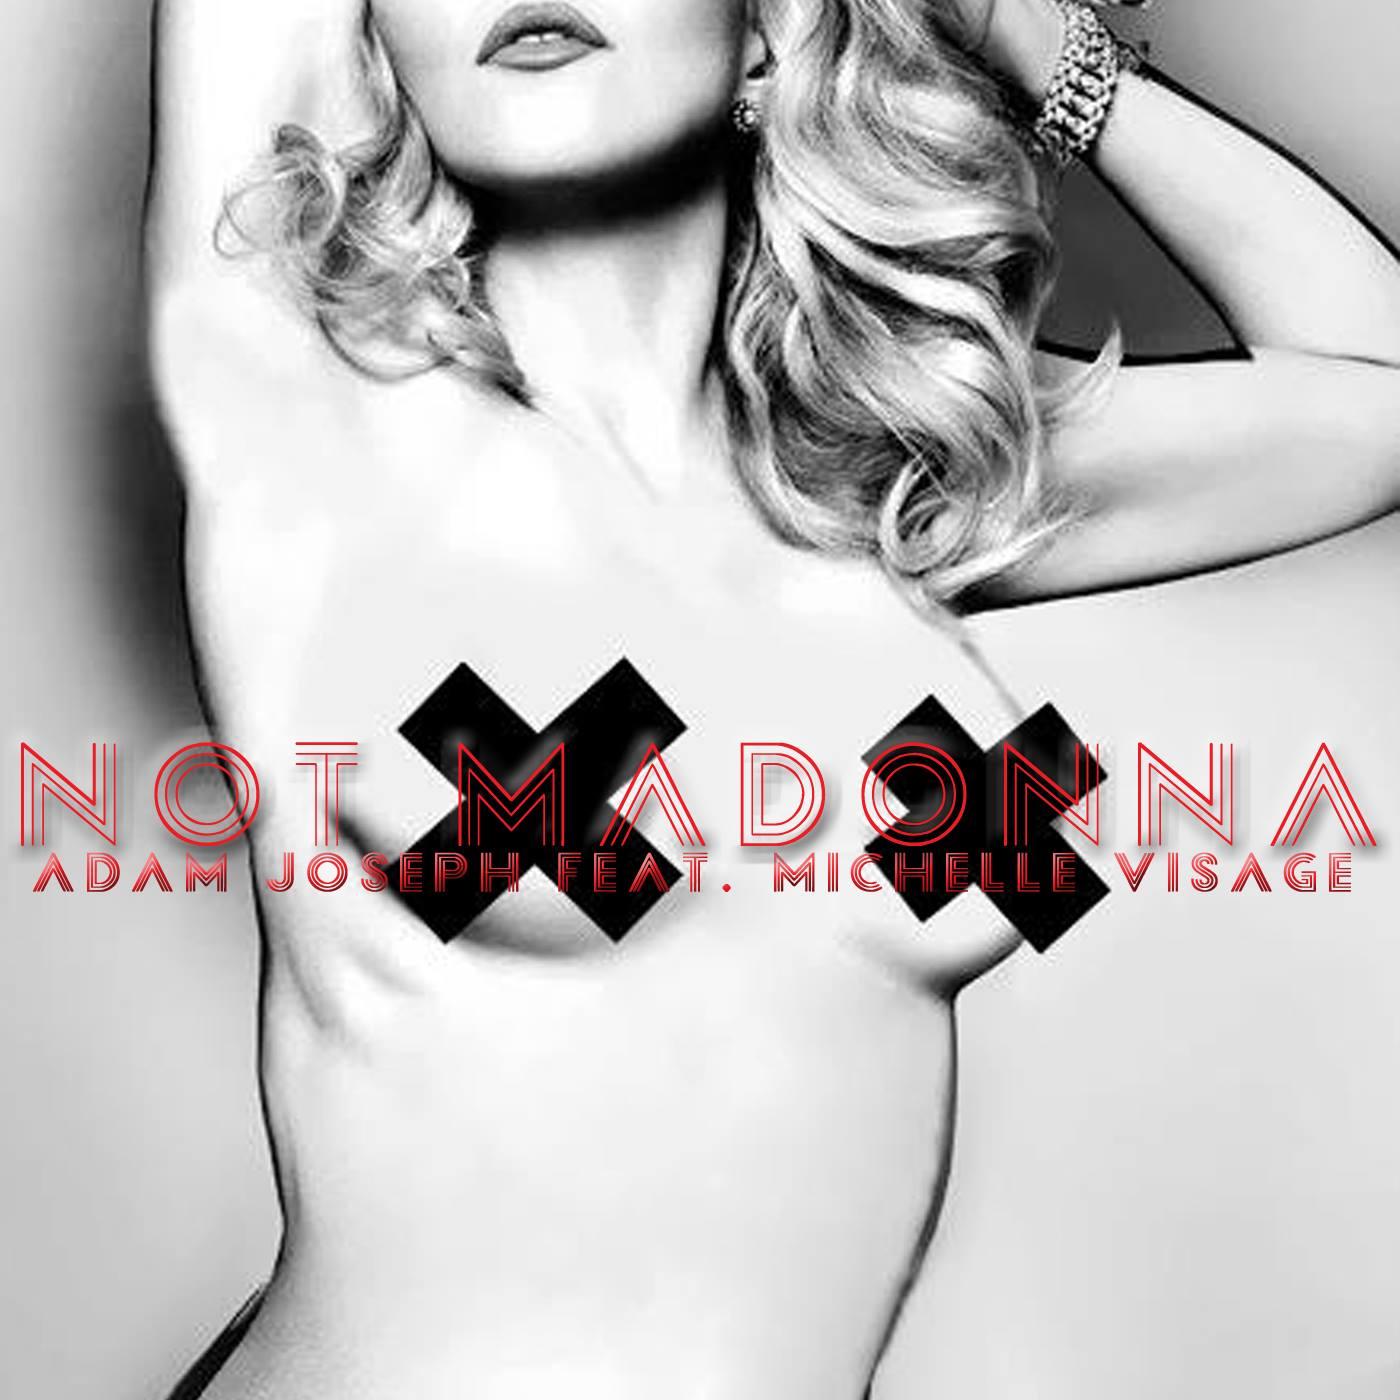 Adam Joseph - Not Madonna (ft. Michelle Visage)